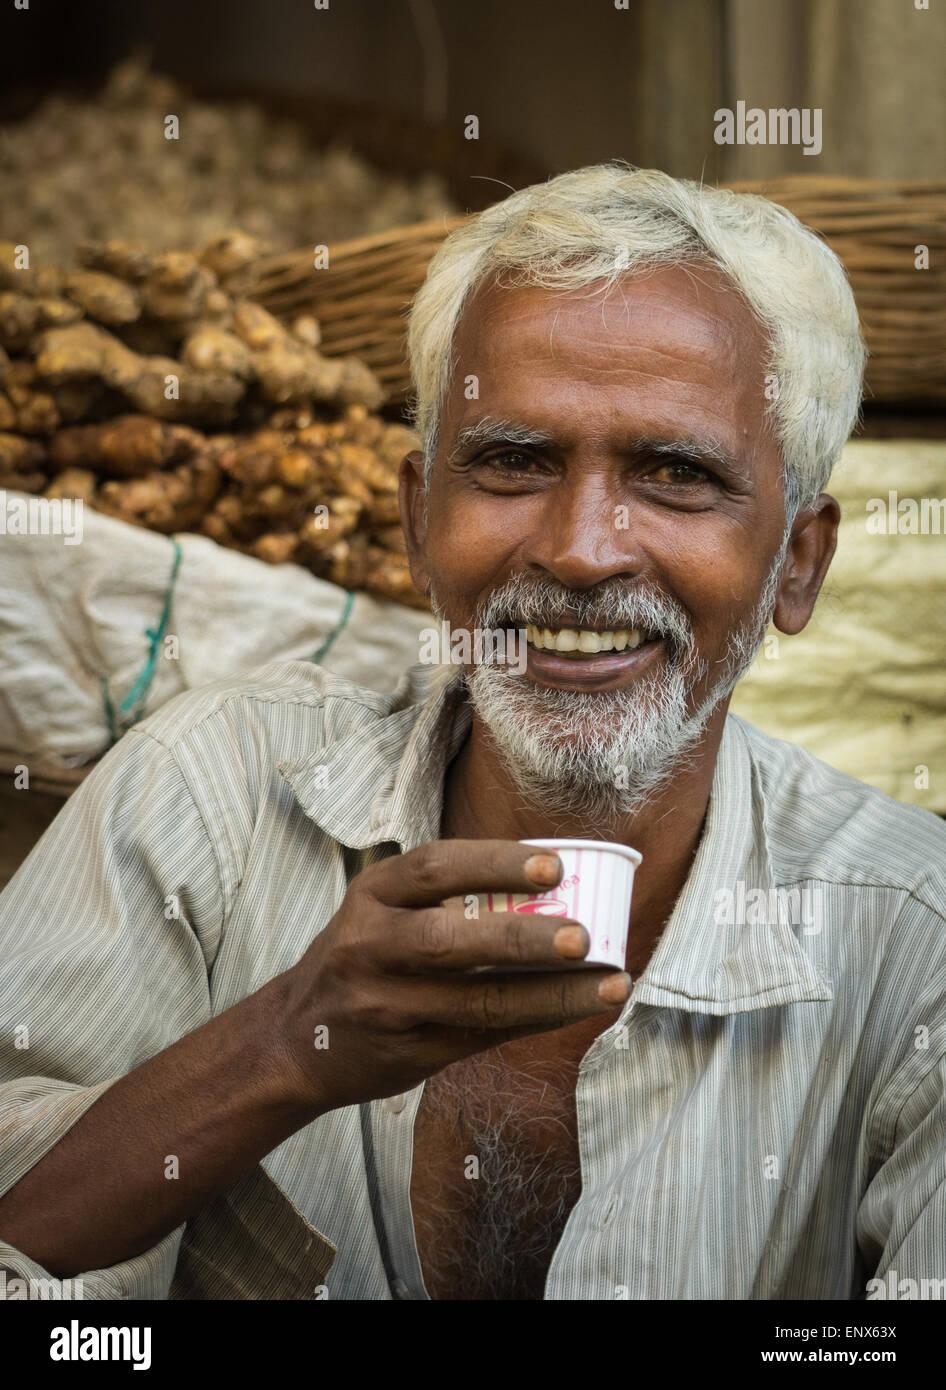 Portrait of a Indian vendor drinking tea in the vegetable market of Tiruvannamalai, India - Stock Image